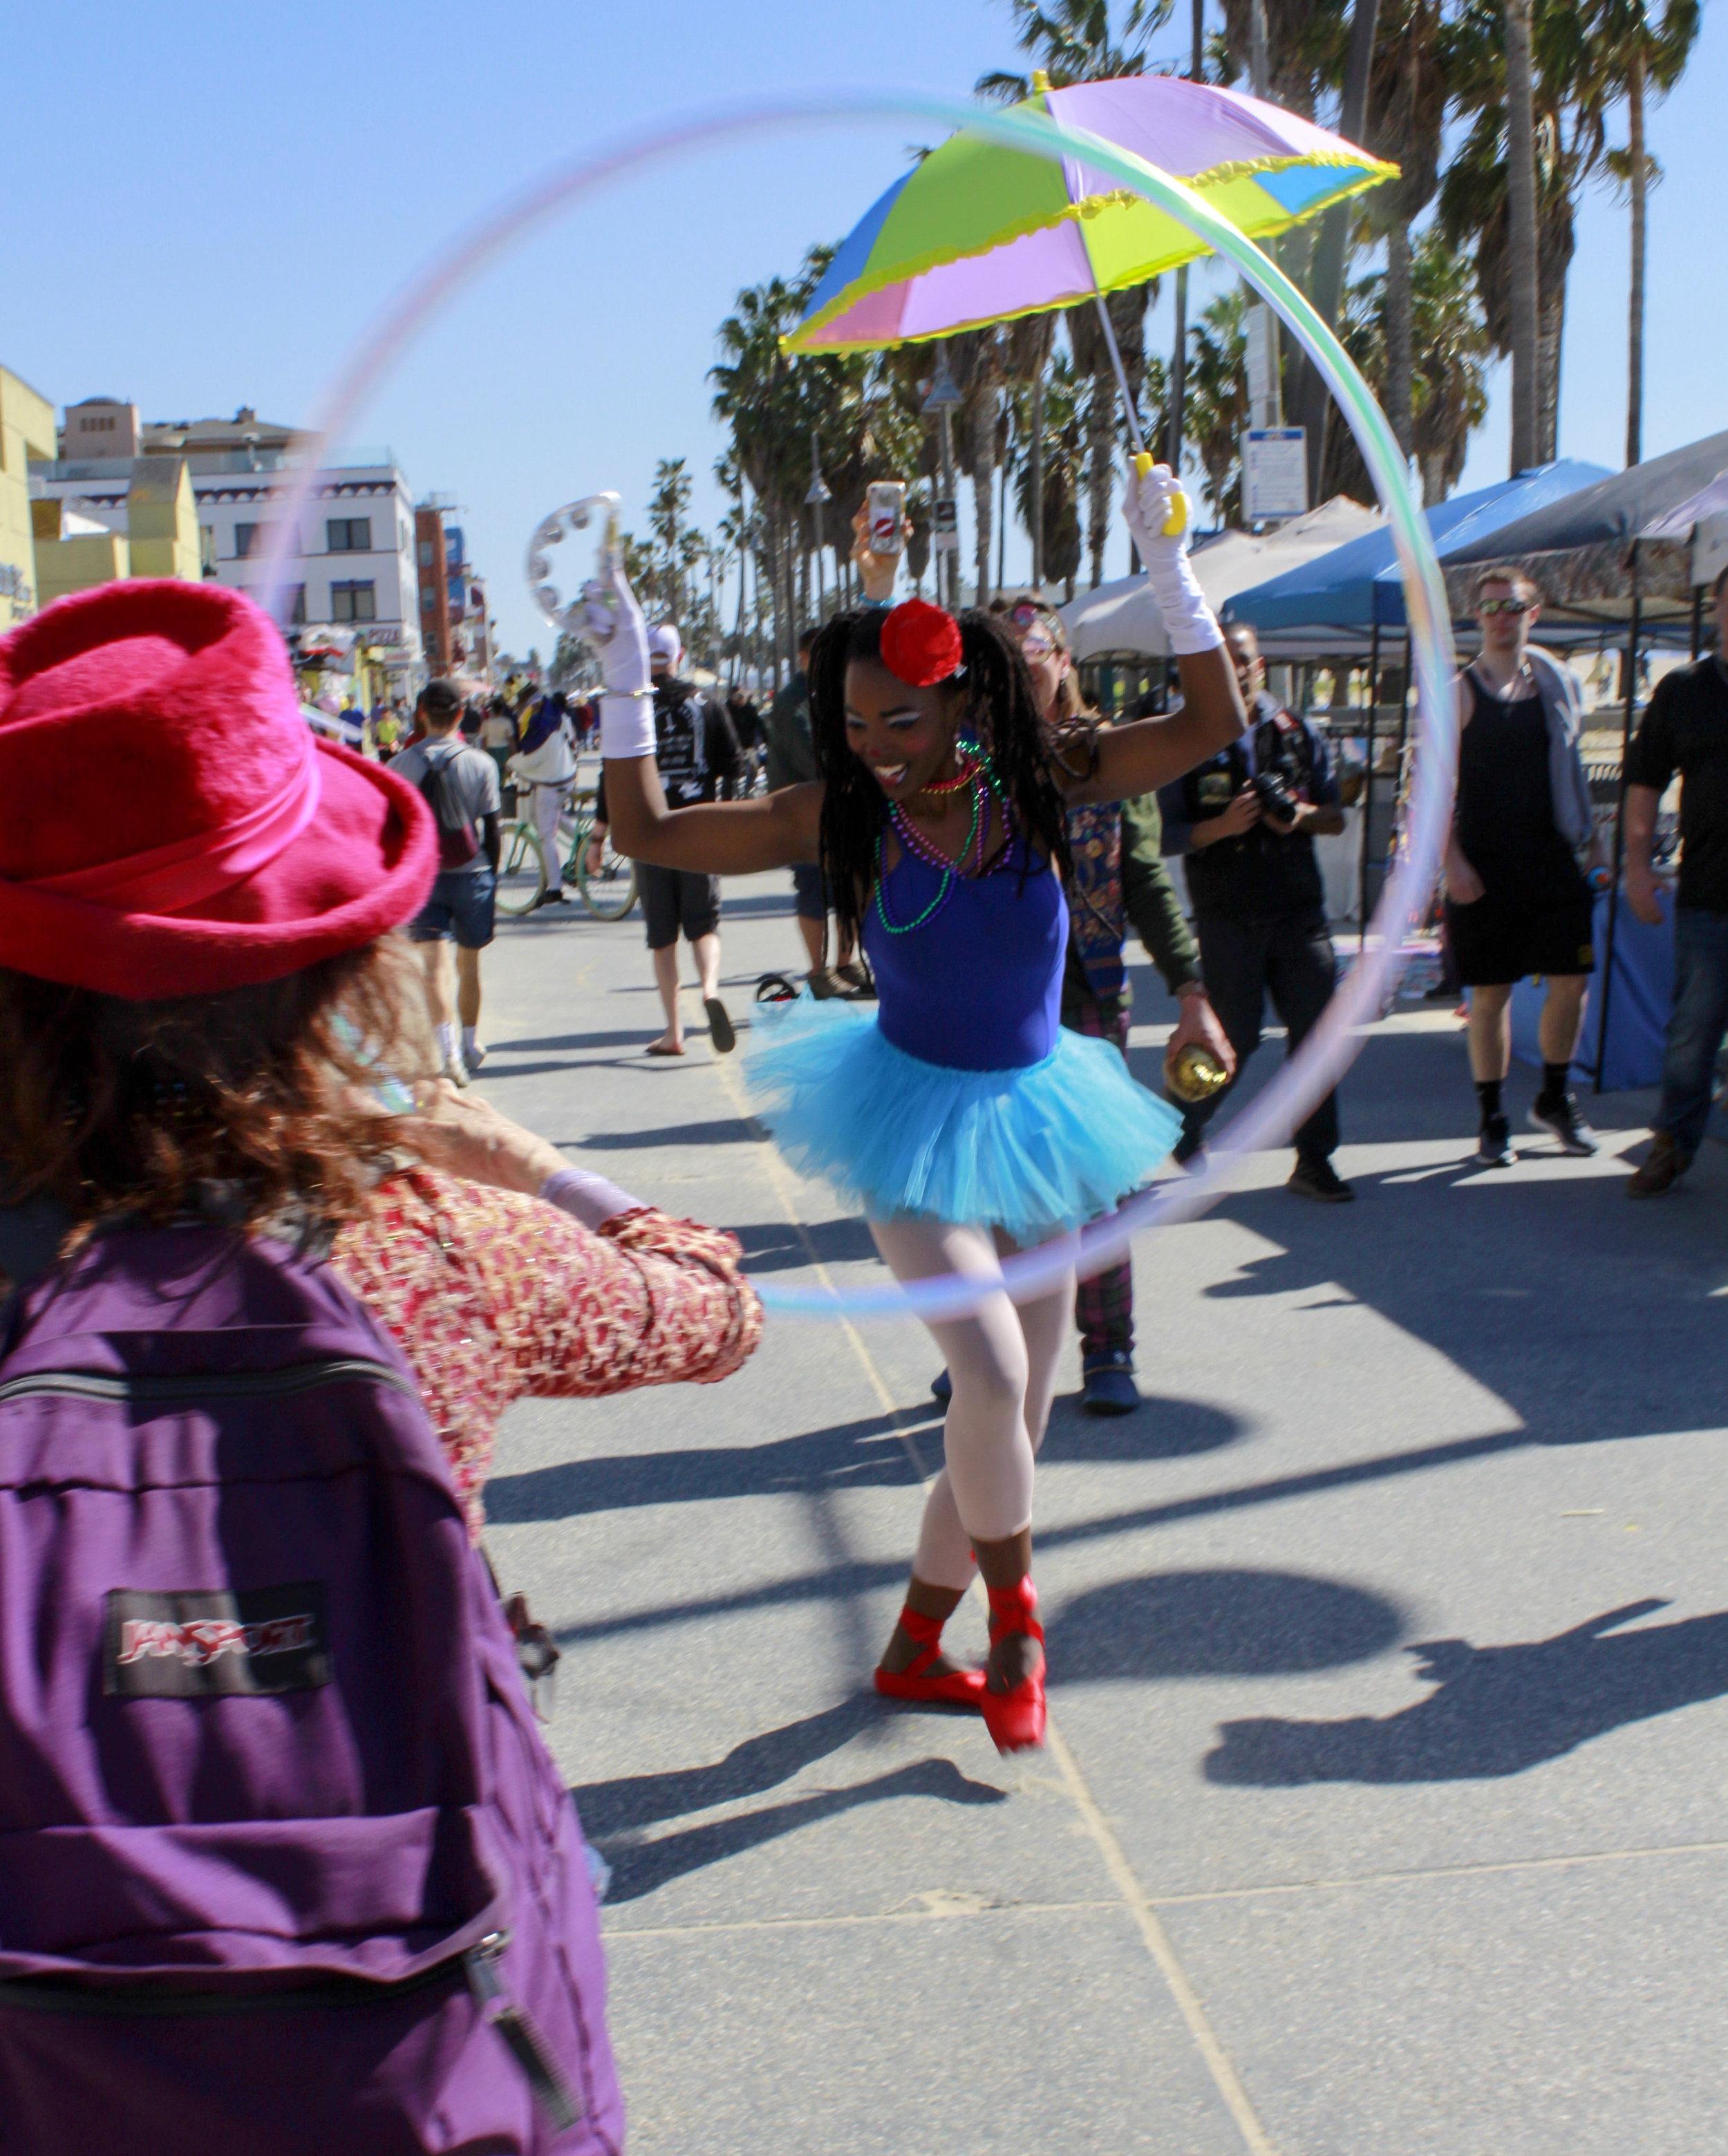 The 17th annual Venice Beach Mardi Gras parade on the boardwalk of Venice Beach in Los Angeles, California on Feb 23, 2019. Photo by Danica Creahan.